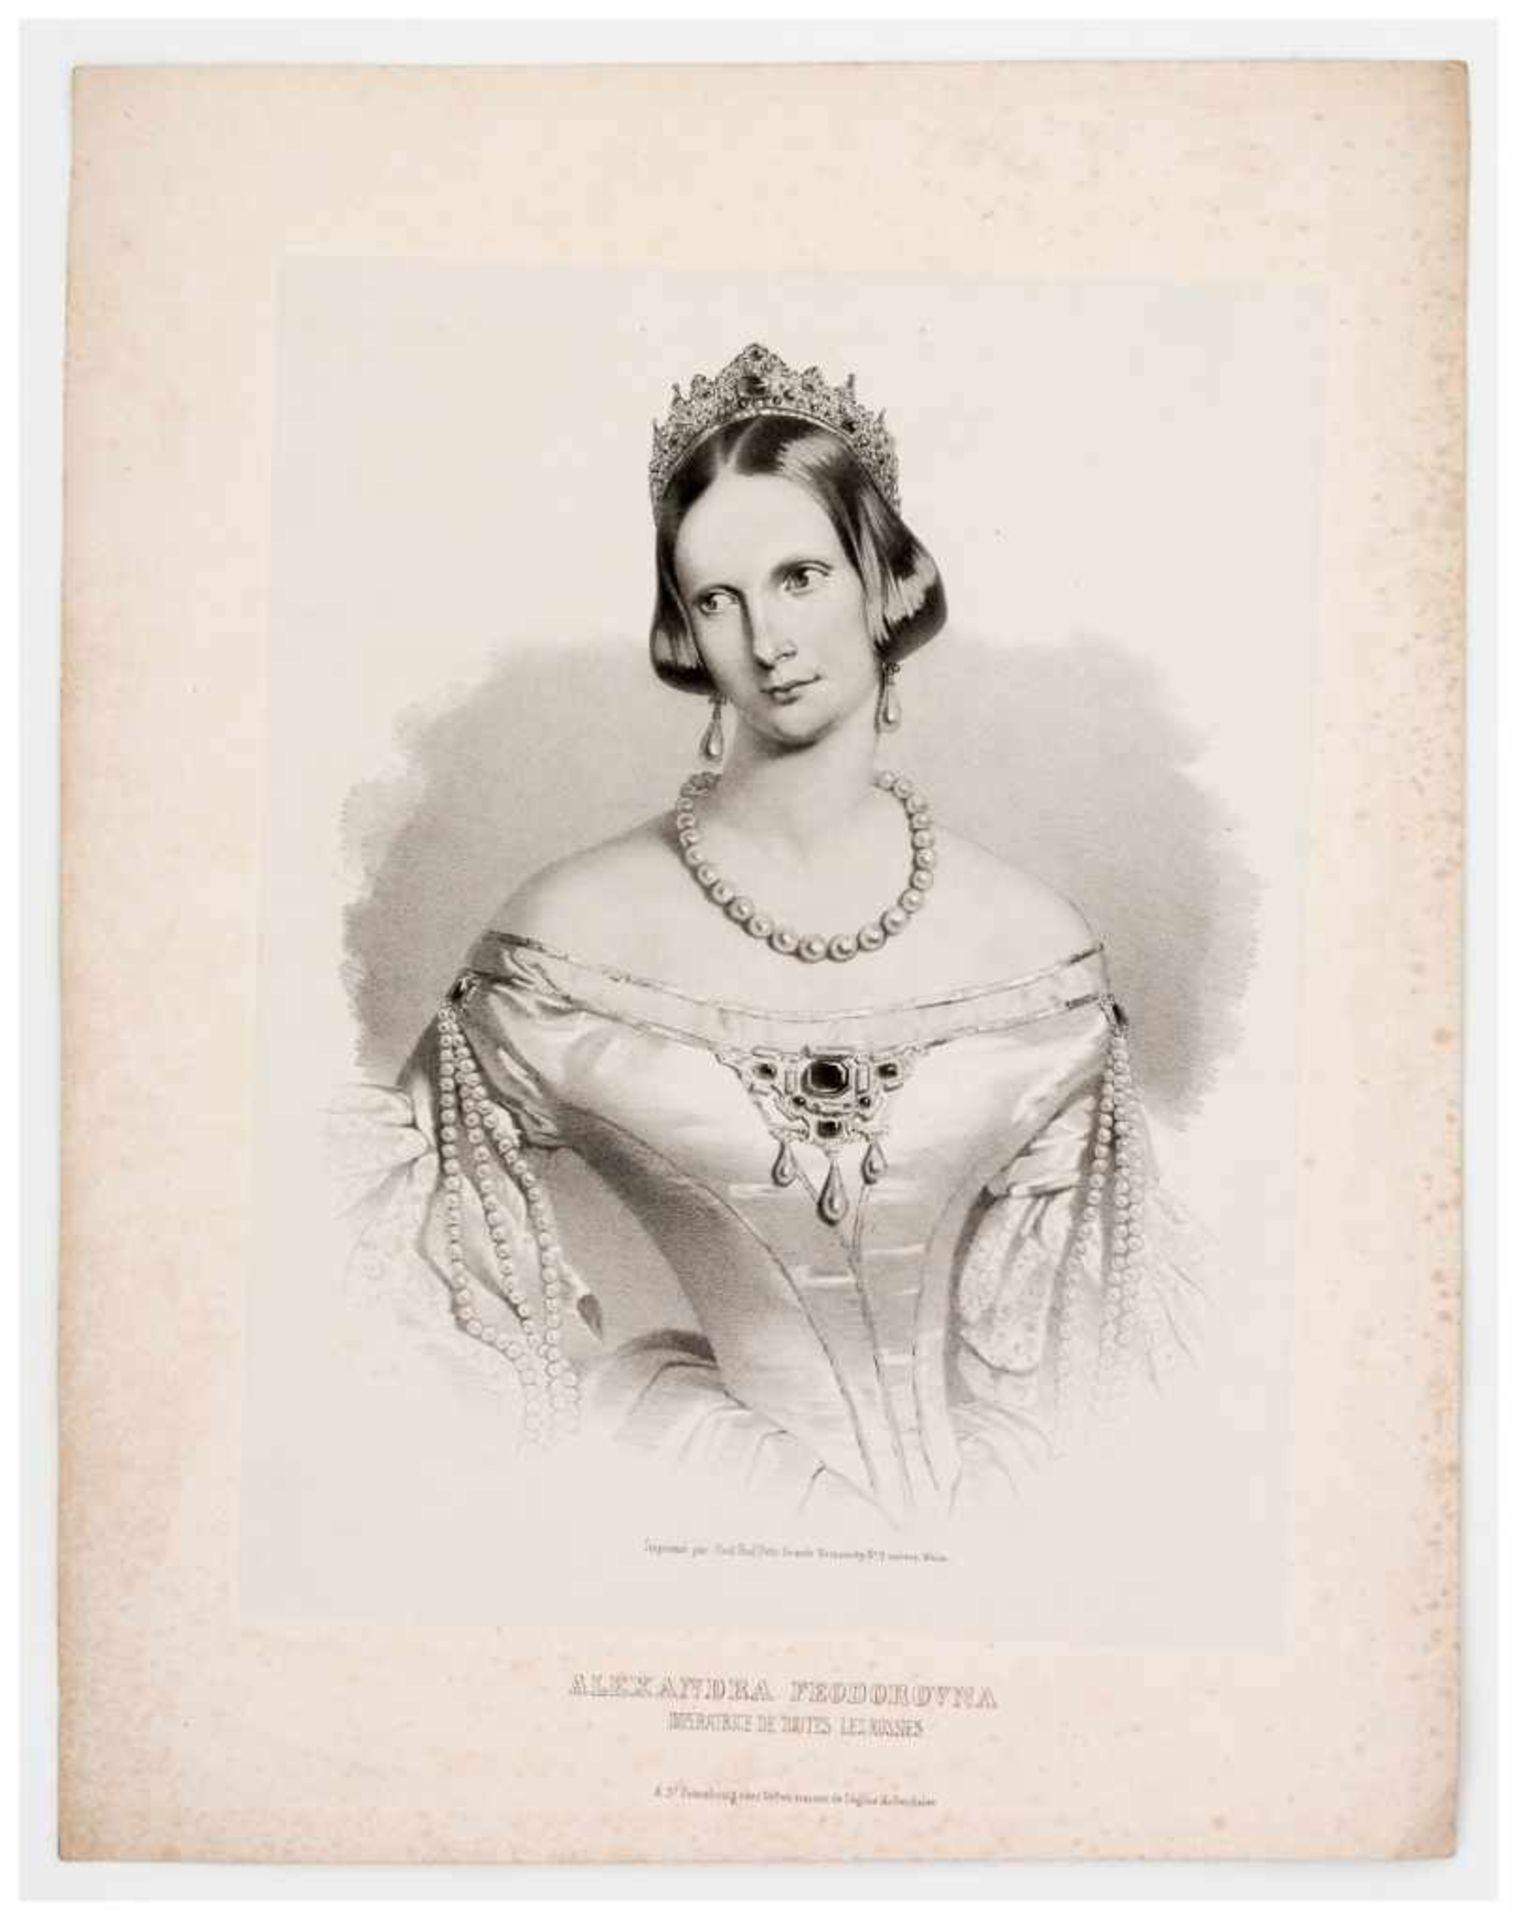 Los 43 - Kaiserin Alexandra Fjodorovna Lithographie, gedruckt in St. Petersburg um 1840 Papiergrösse: ca.